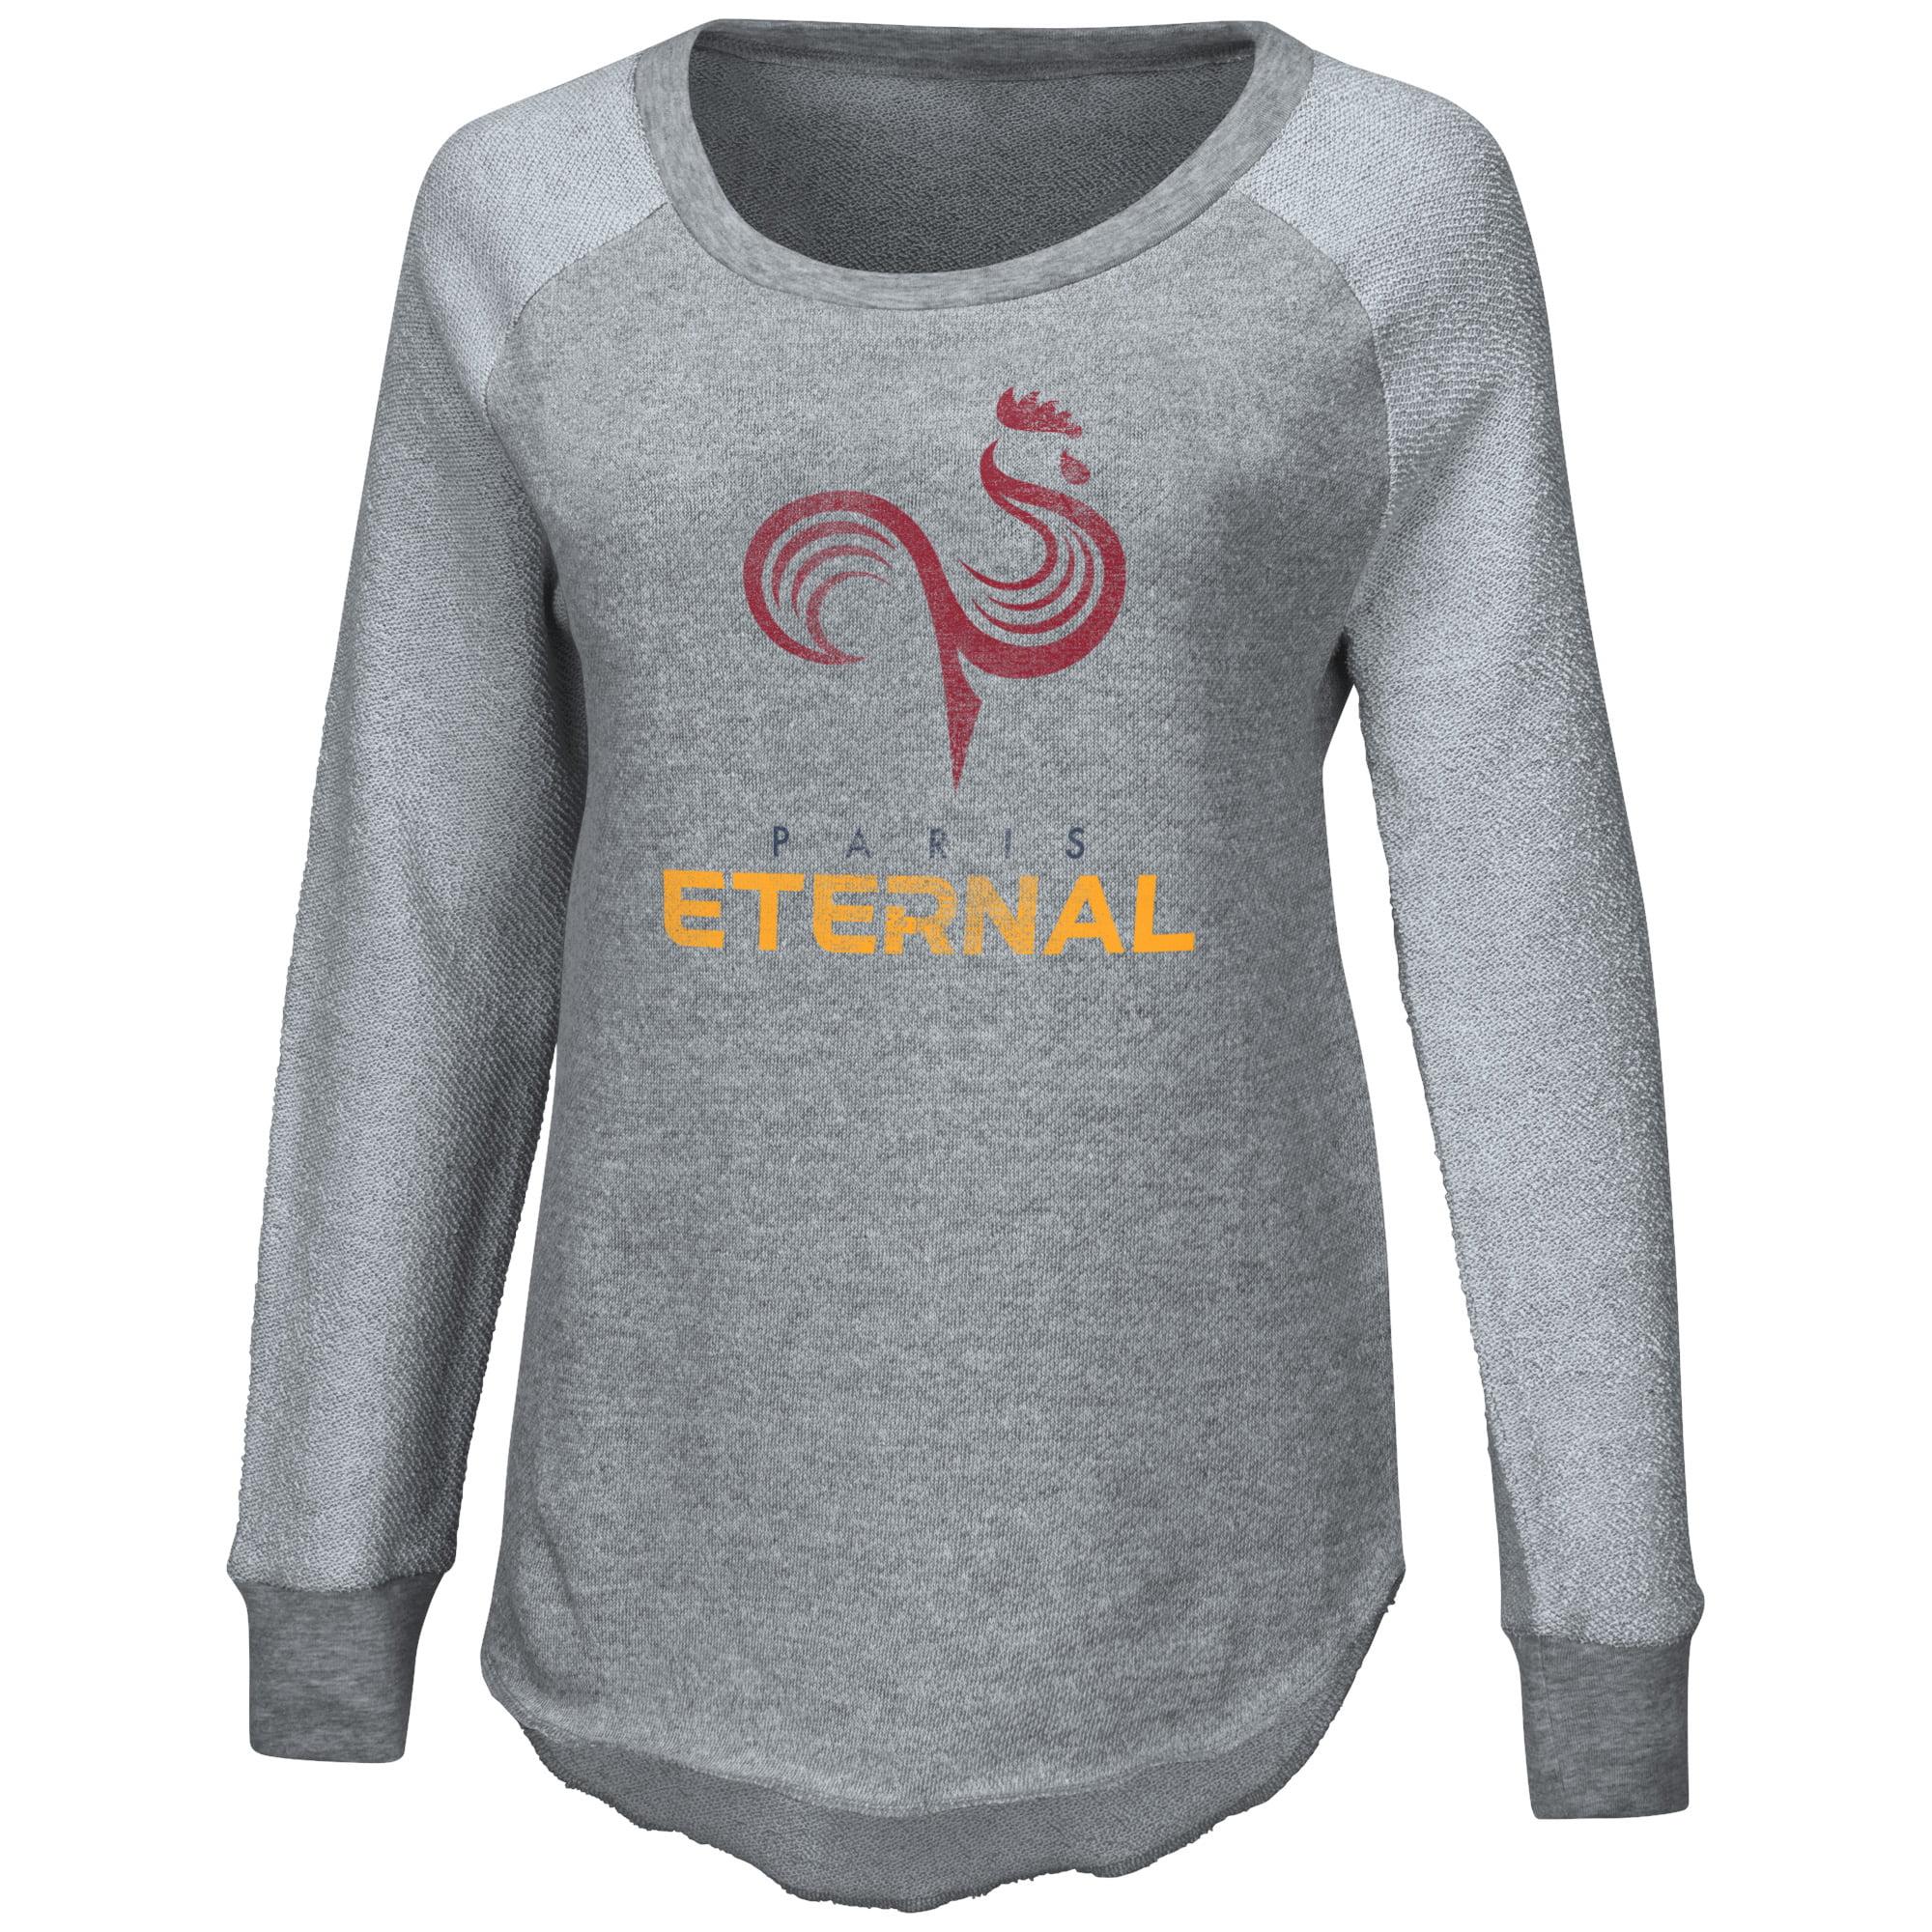 Paris Eternal G-III 4Her by Carl Banks Women's Raglan Pullover Sweatshirt - Heather Gray